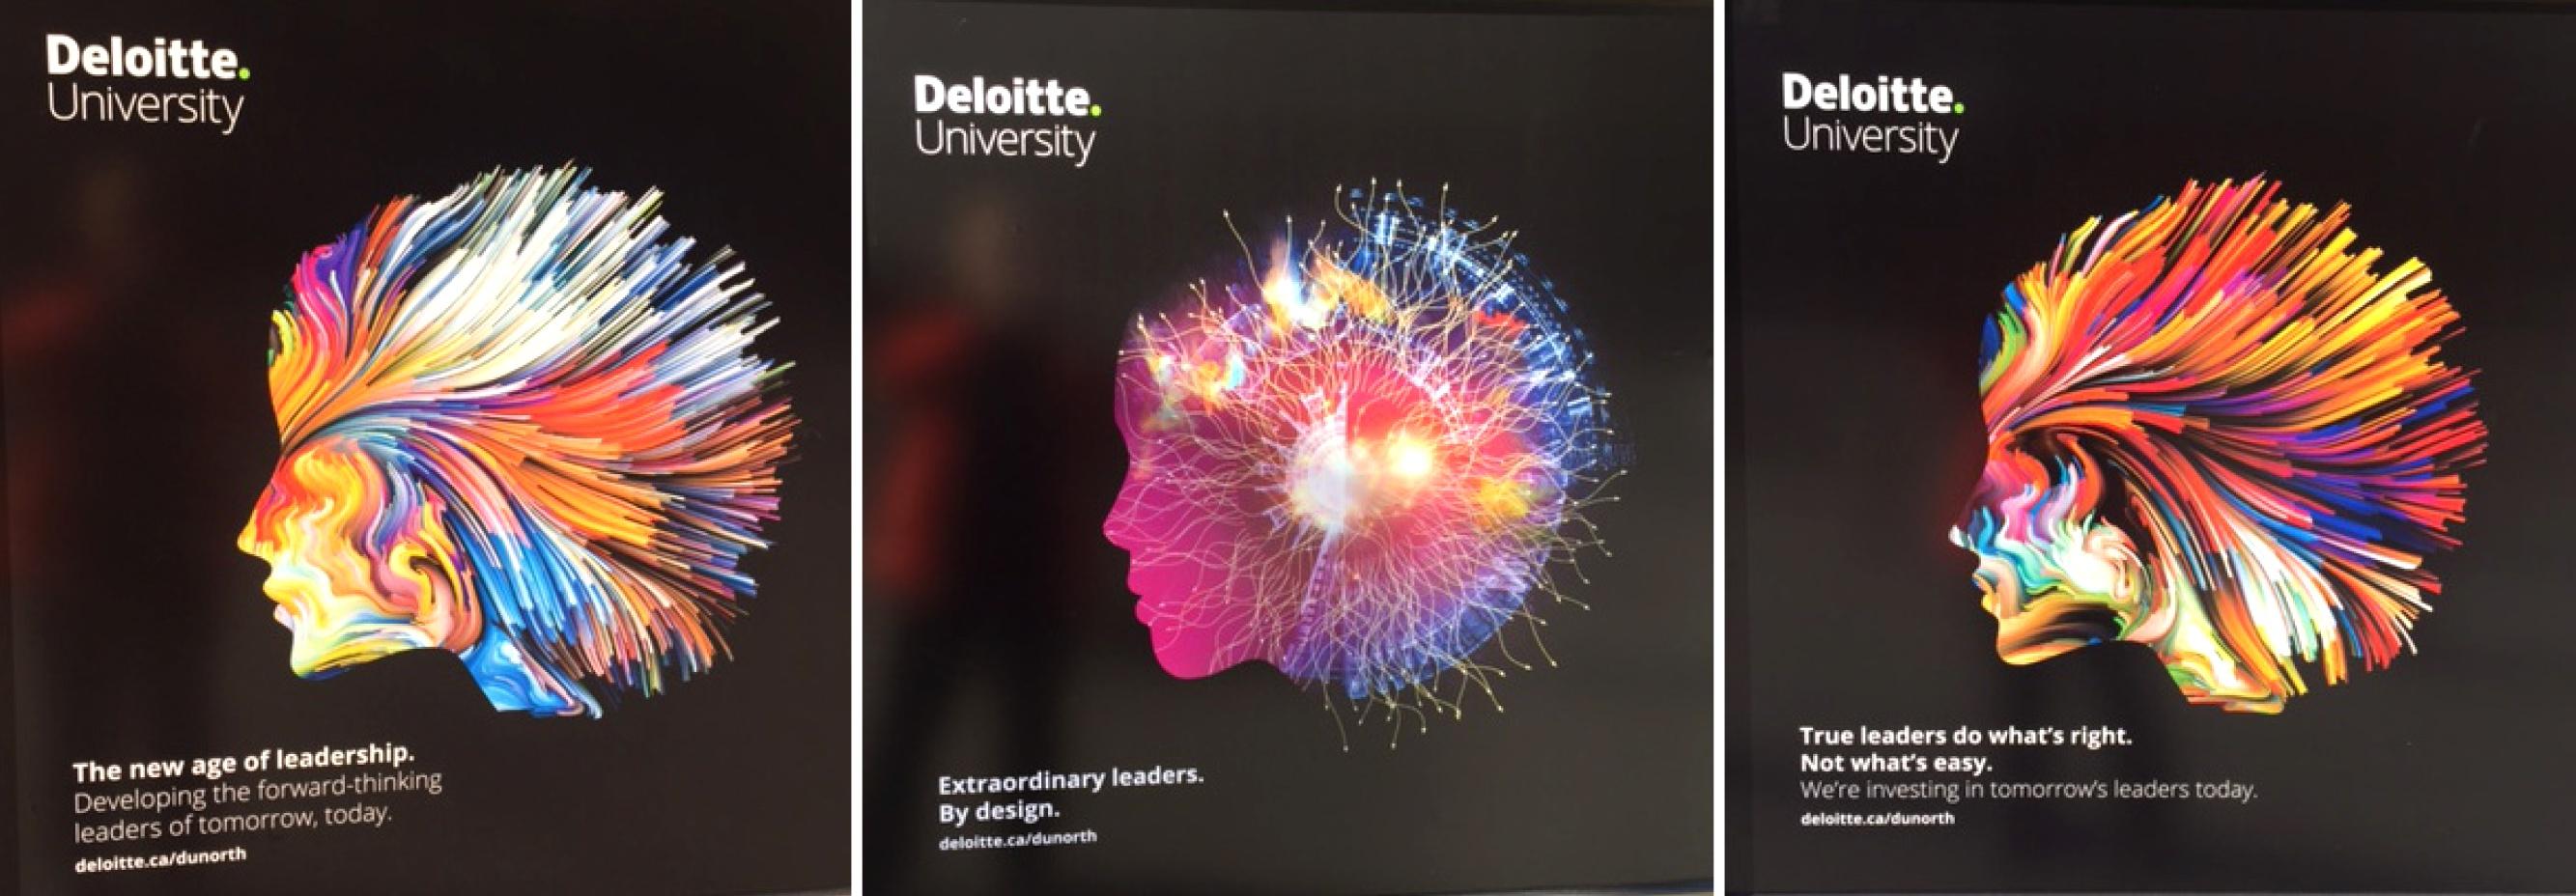 Deloitte-right-path-aboutmybrain.jpg